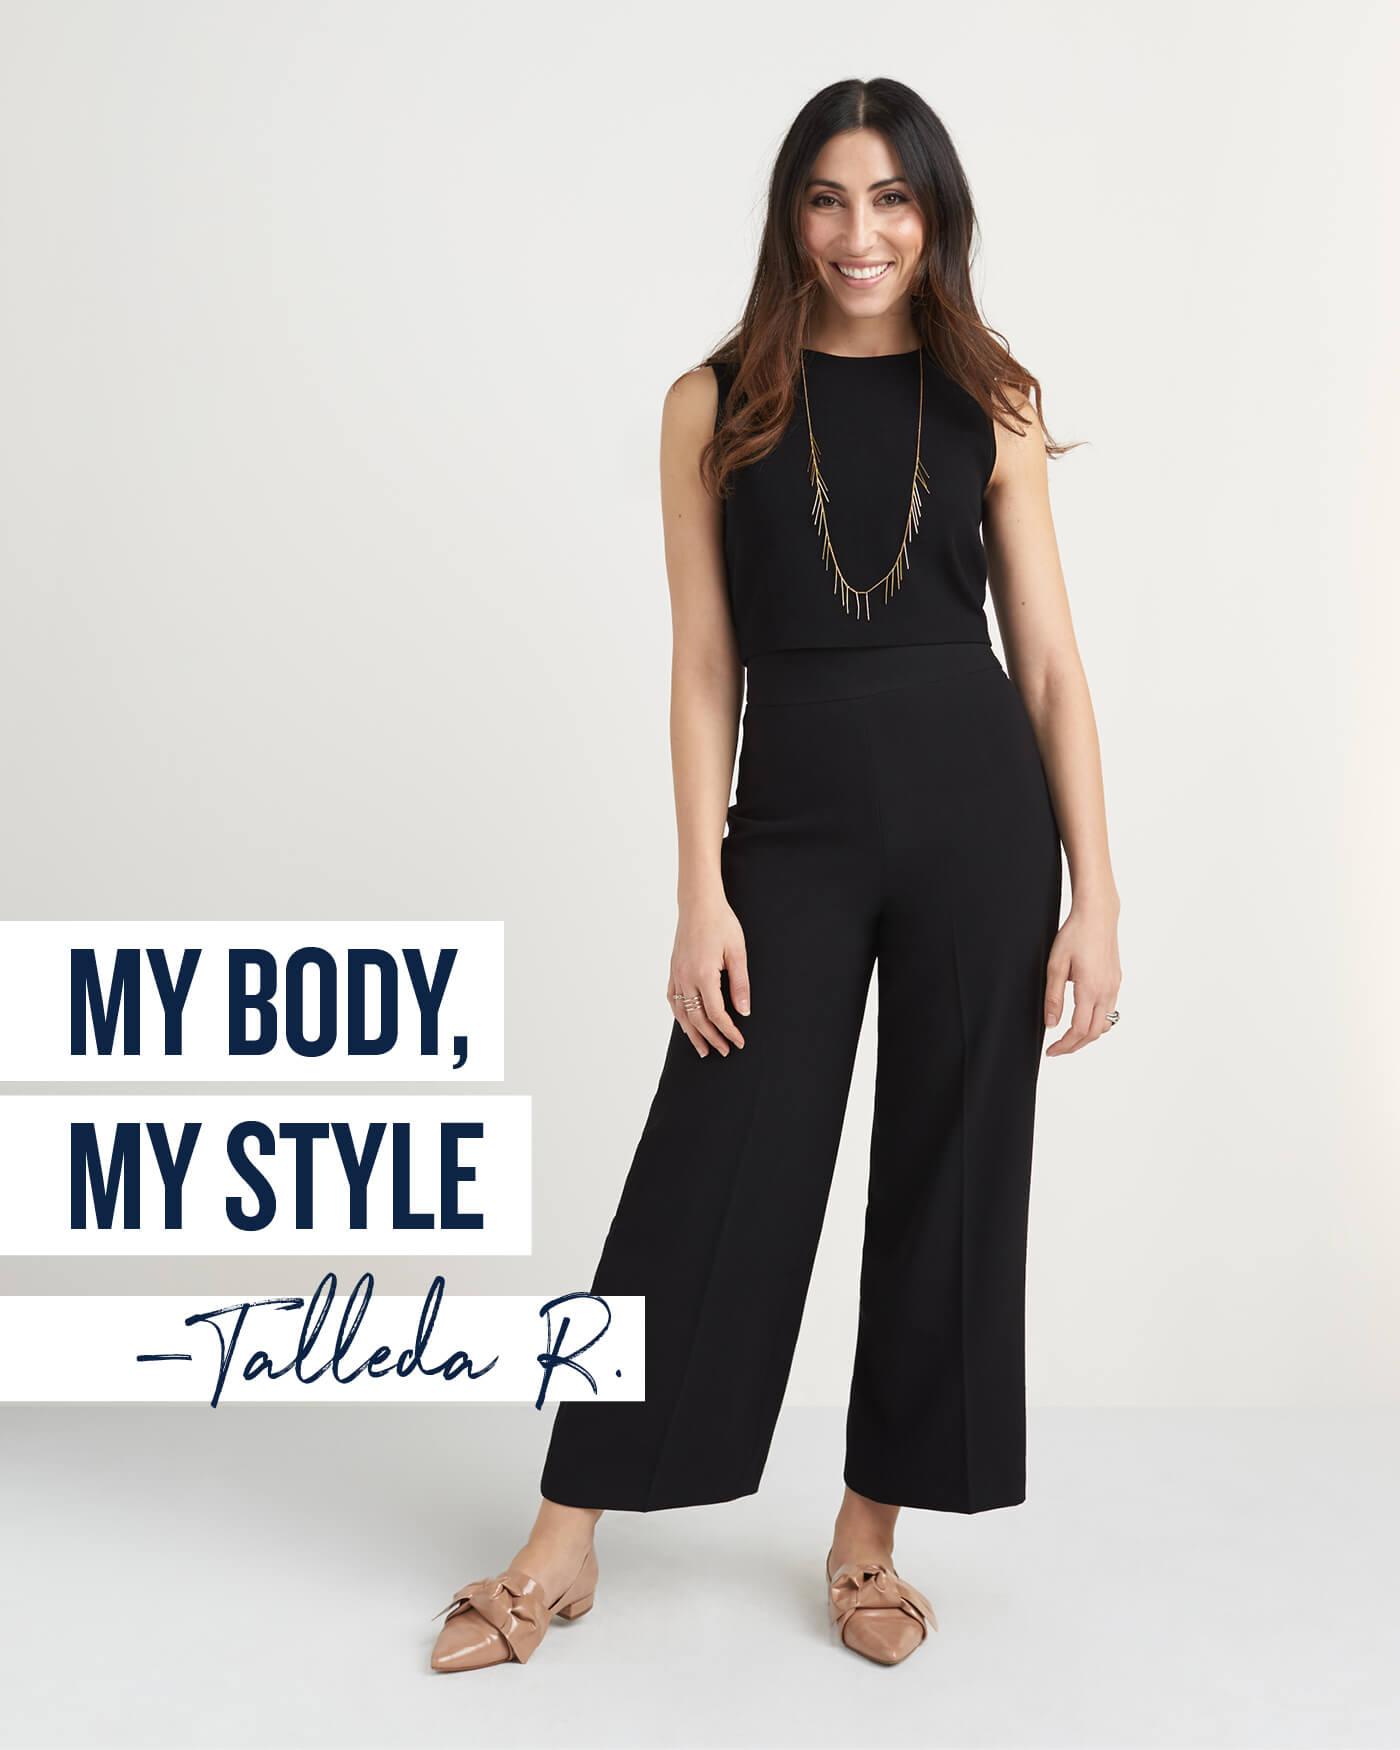 My Body My Style: Talleda R.